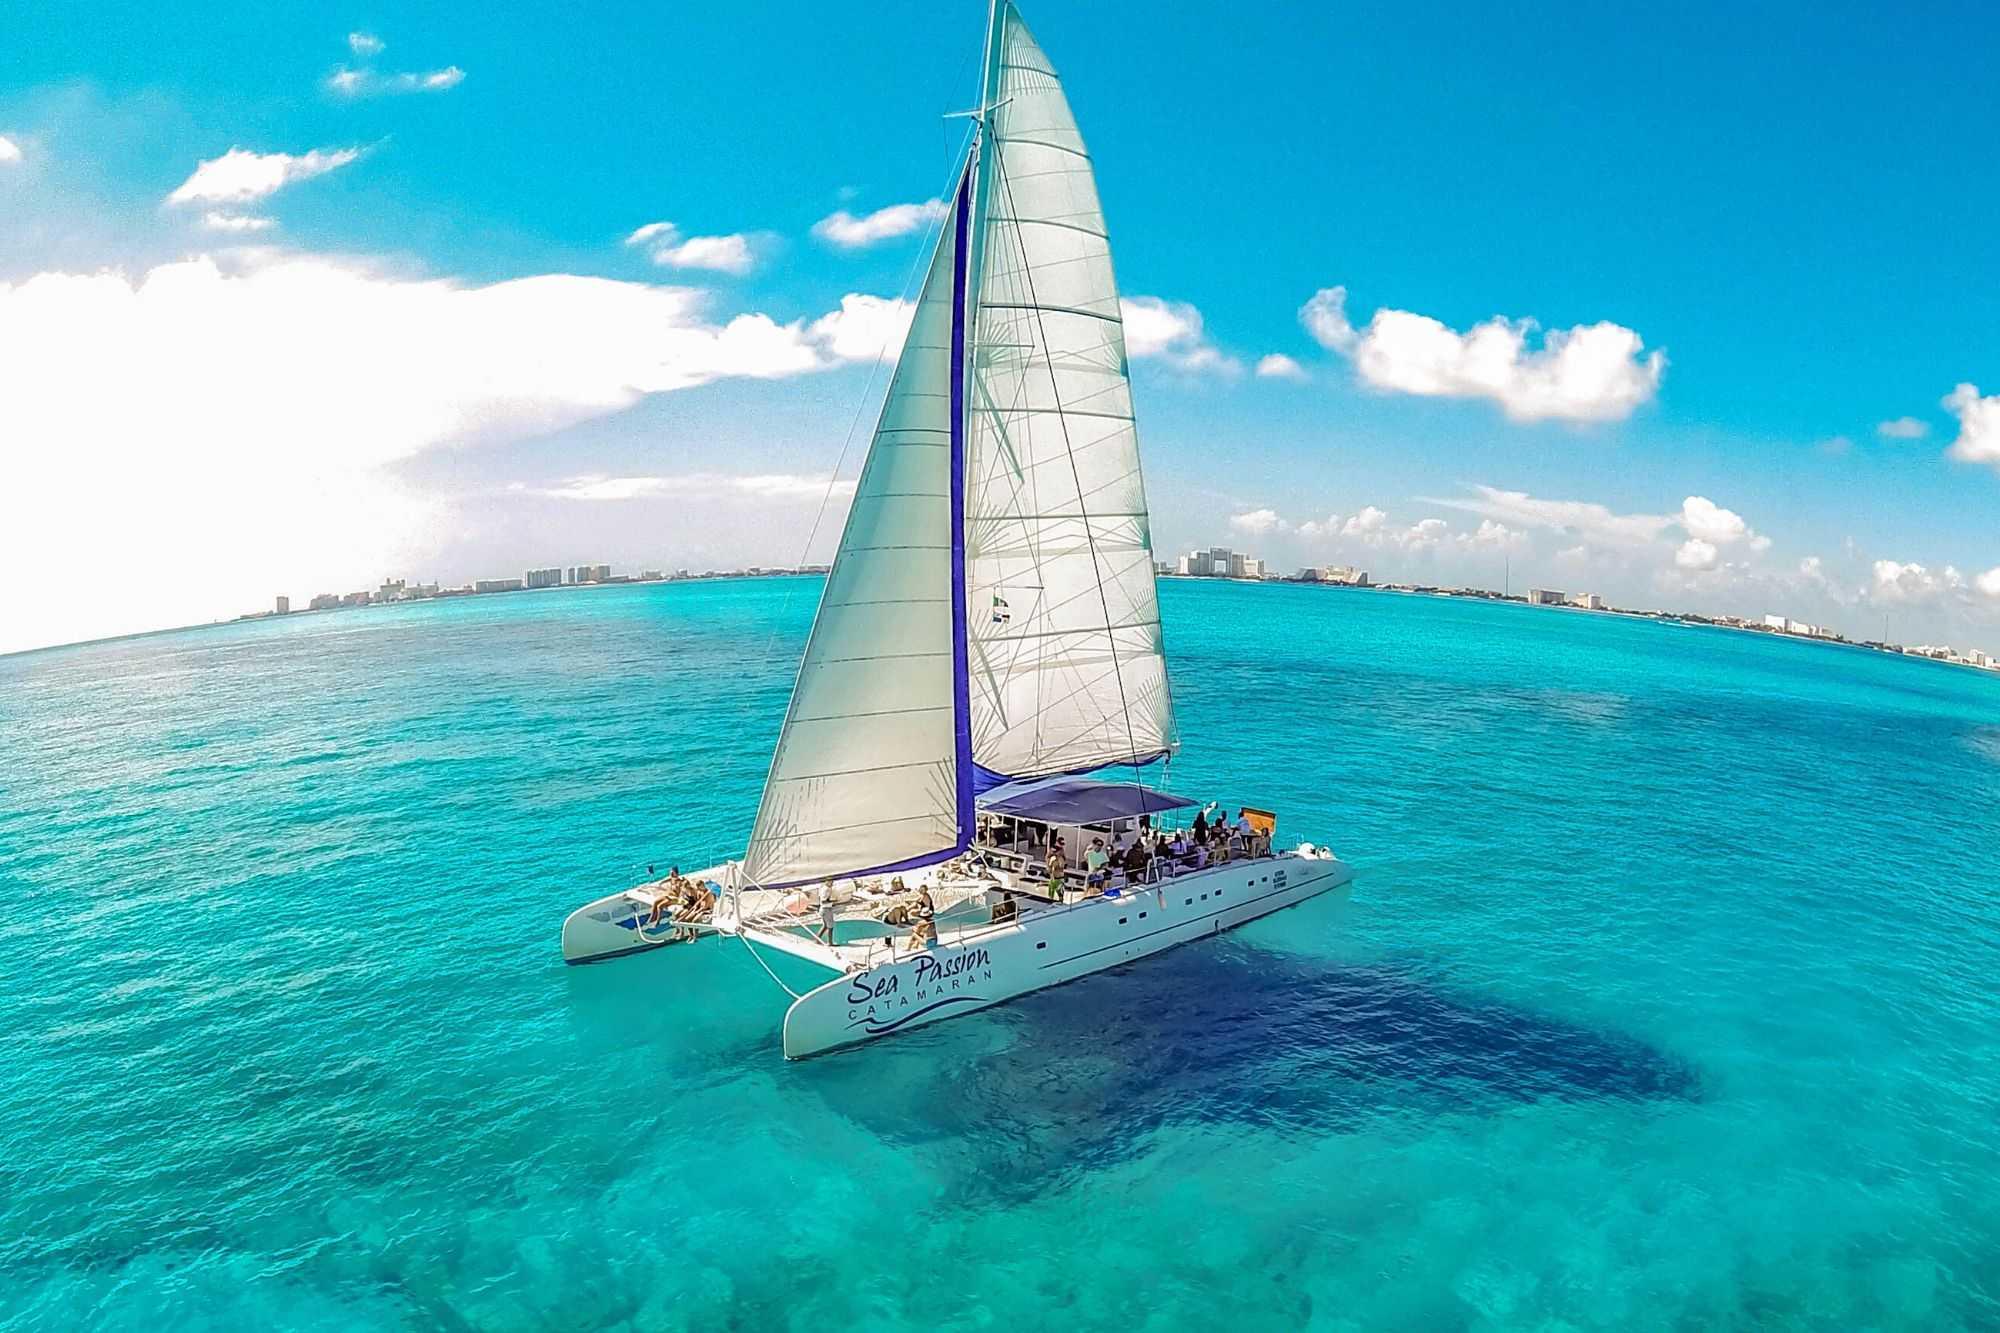 5 Private Isla Mujeres tour in catamaran - Sea Passion I II - Cancun Sailing